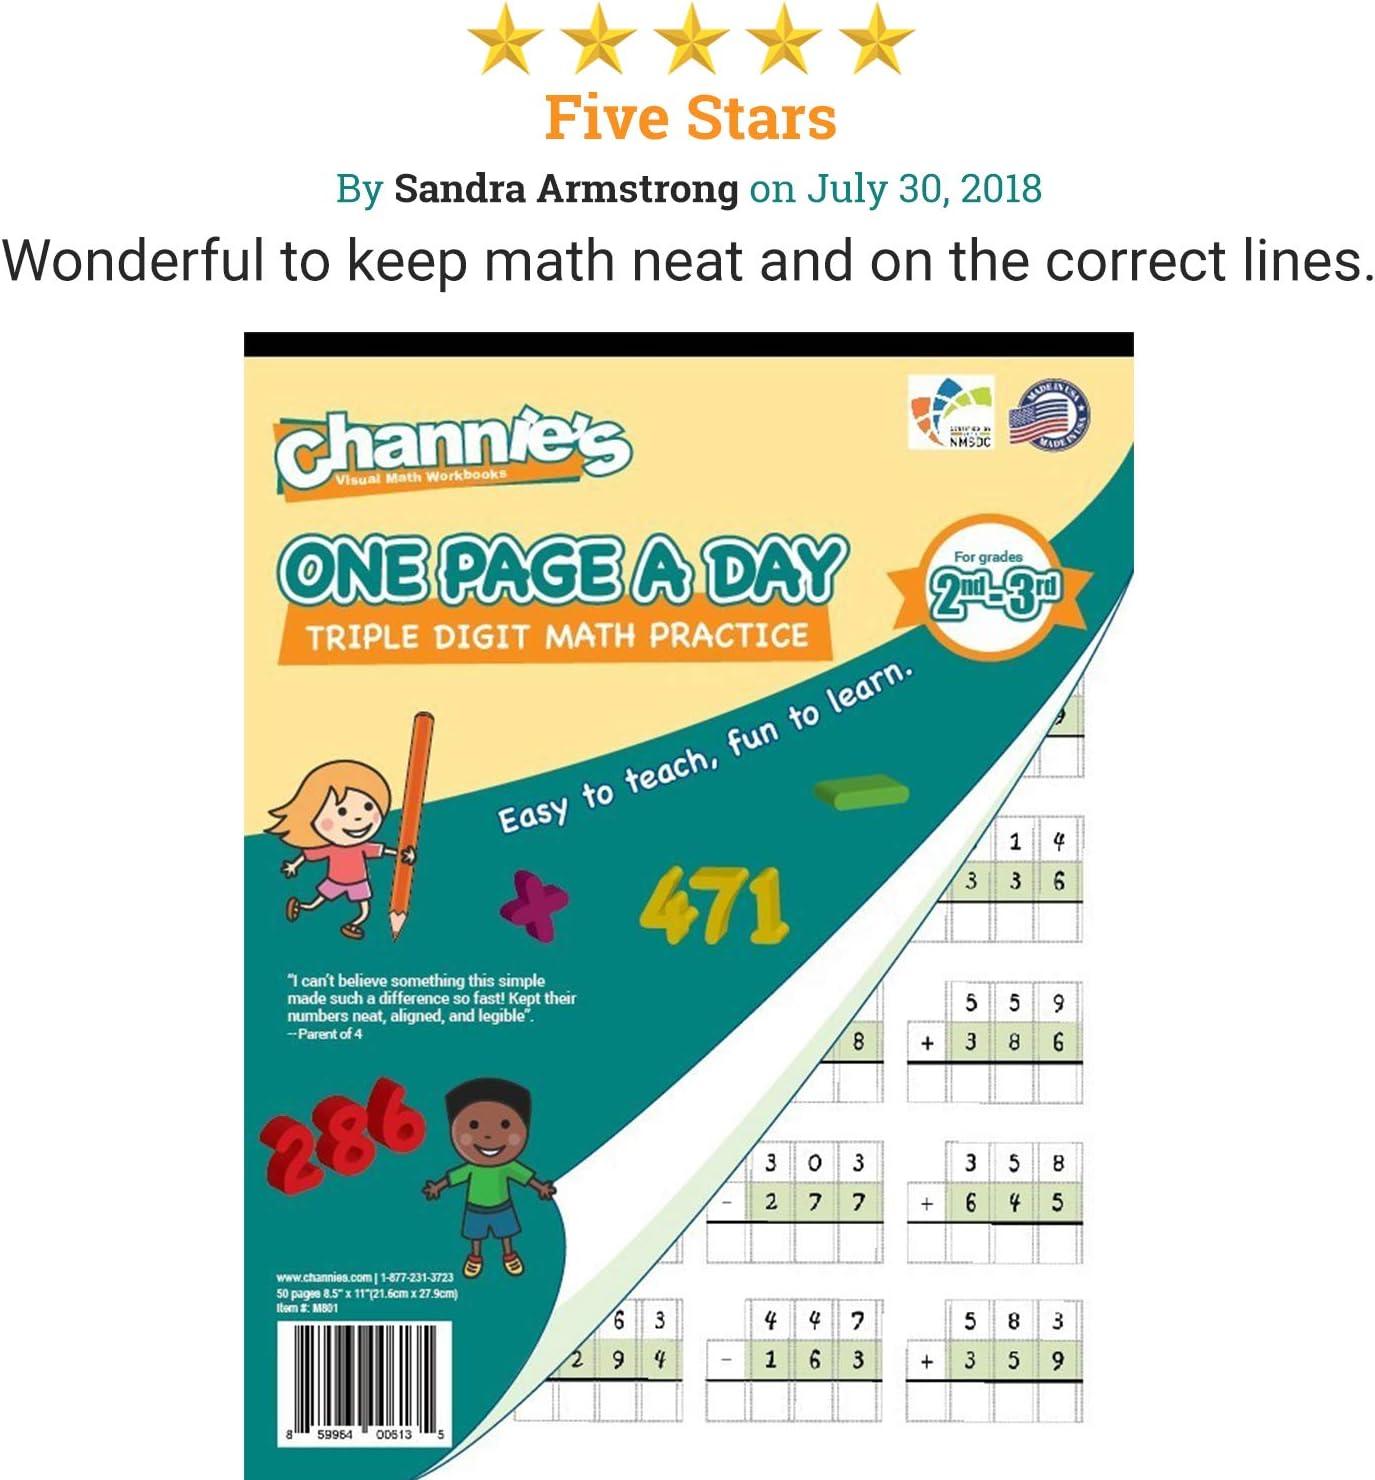 - Amazon.com : Channie's One Page A Day Workbook, Triple Digit Math